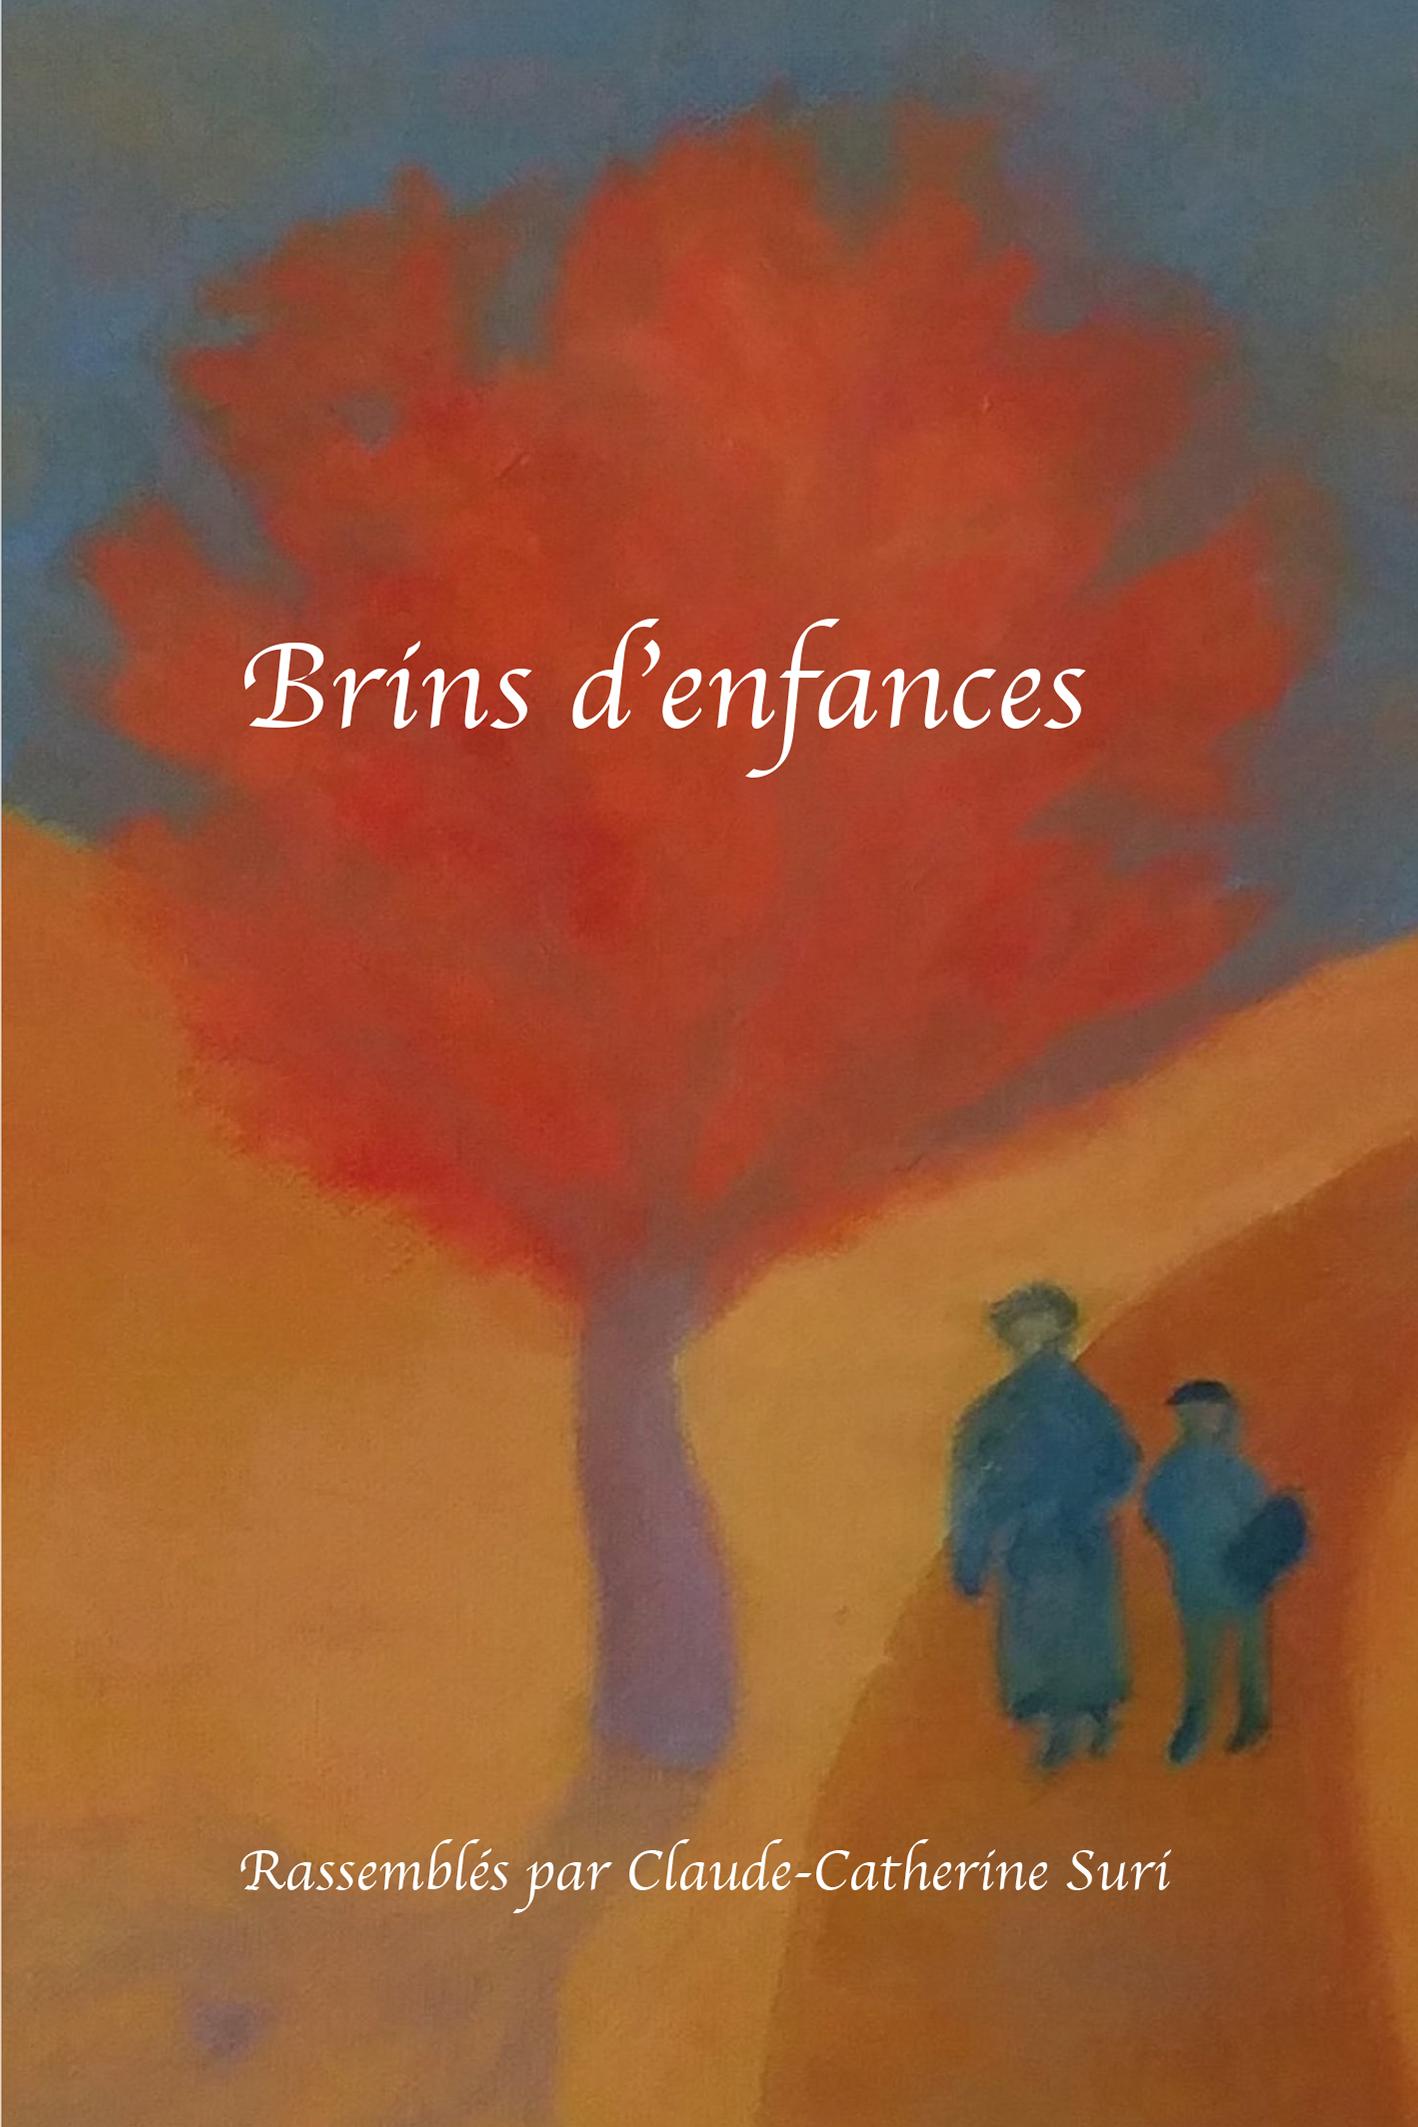 BRINS D'ENFANCE